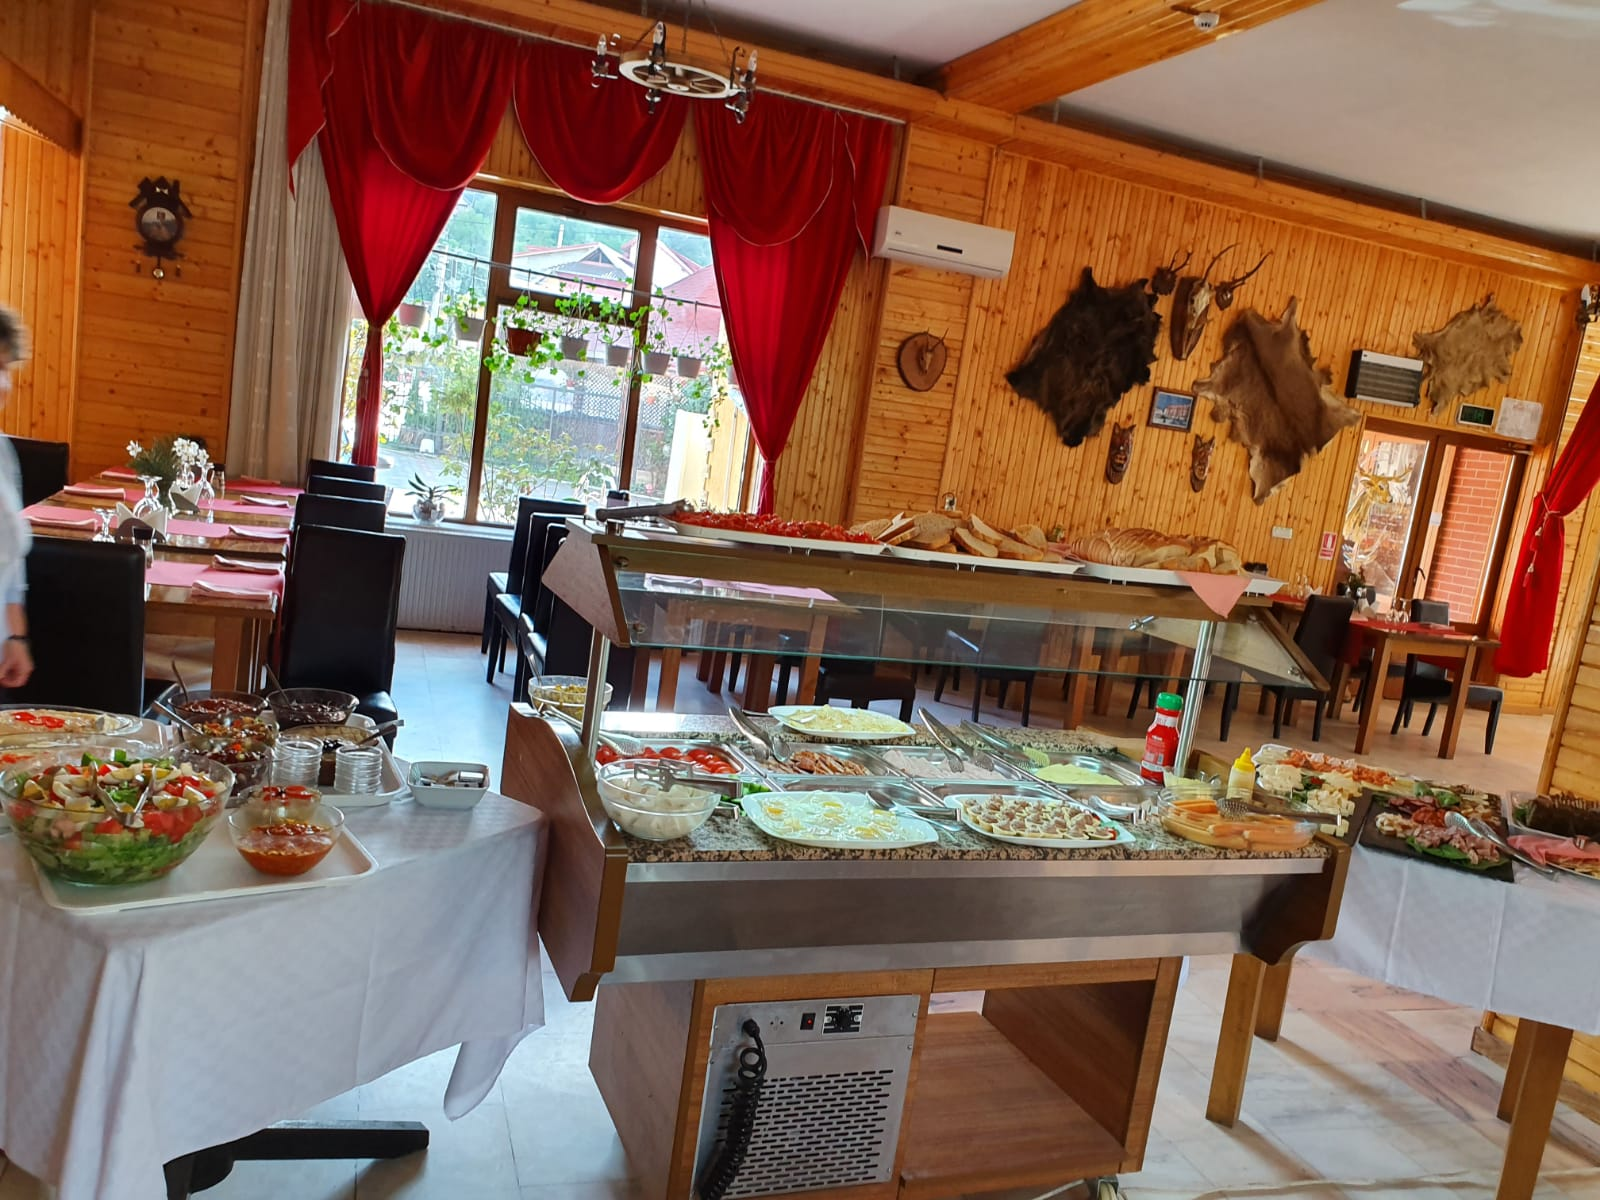 Restaurant bufet meniu restaurant Transfagarasan pensiune restaurant arges